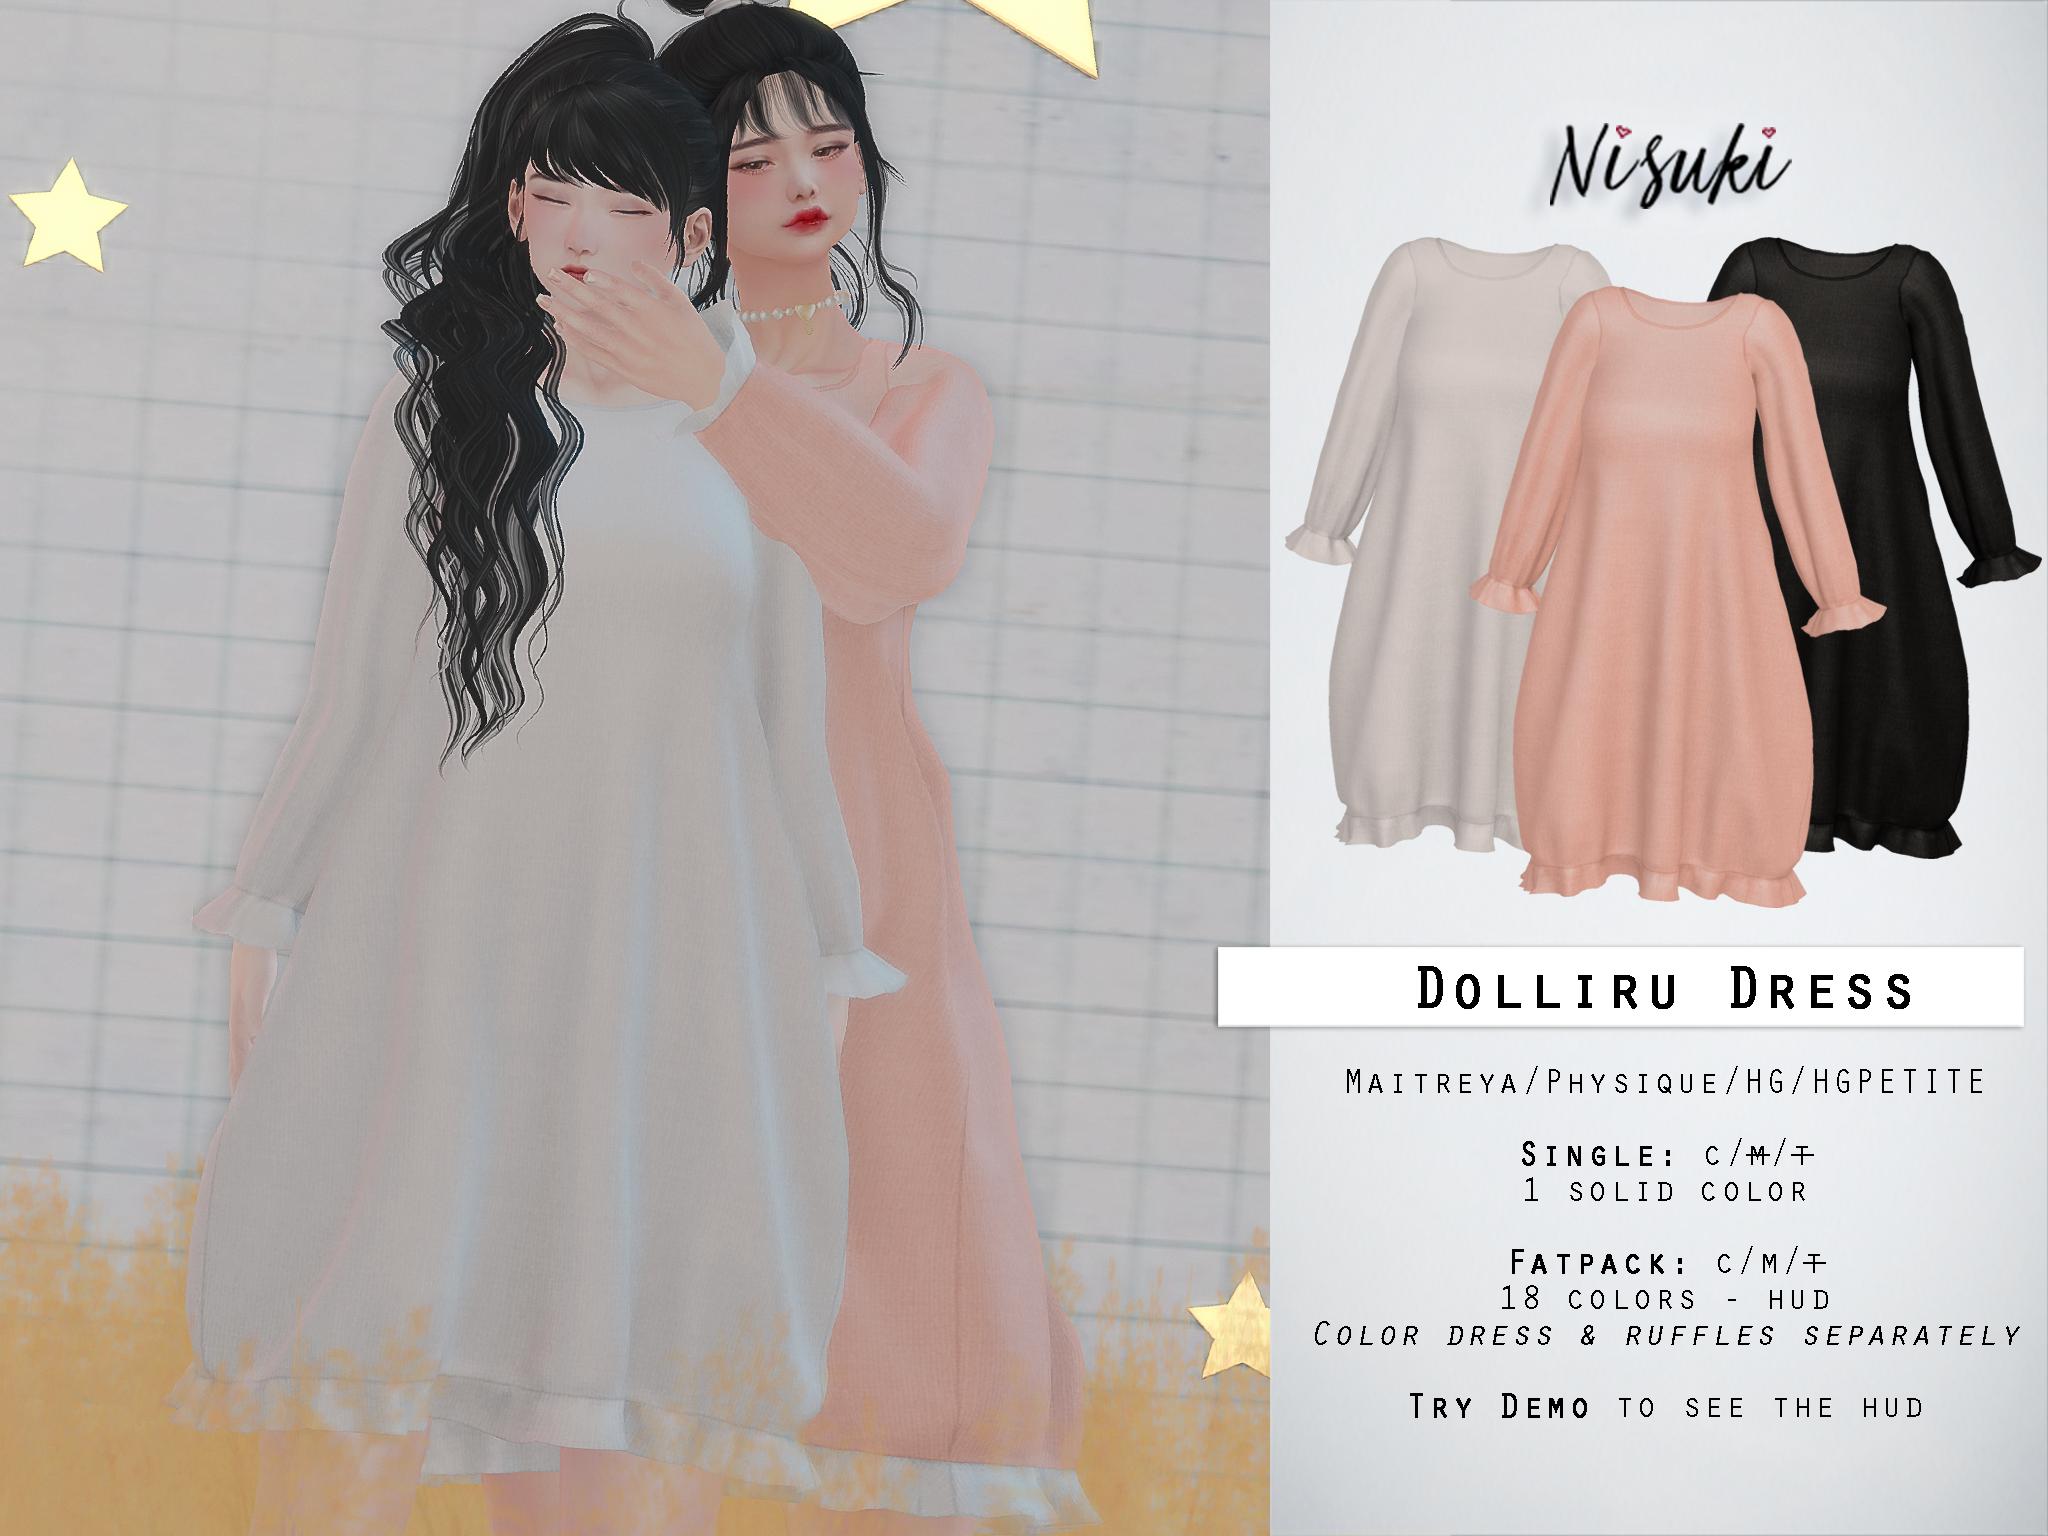 Nisuki + Dolliru Dress.png